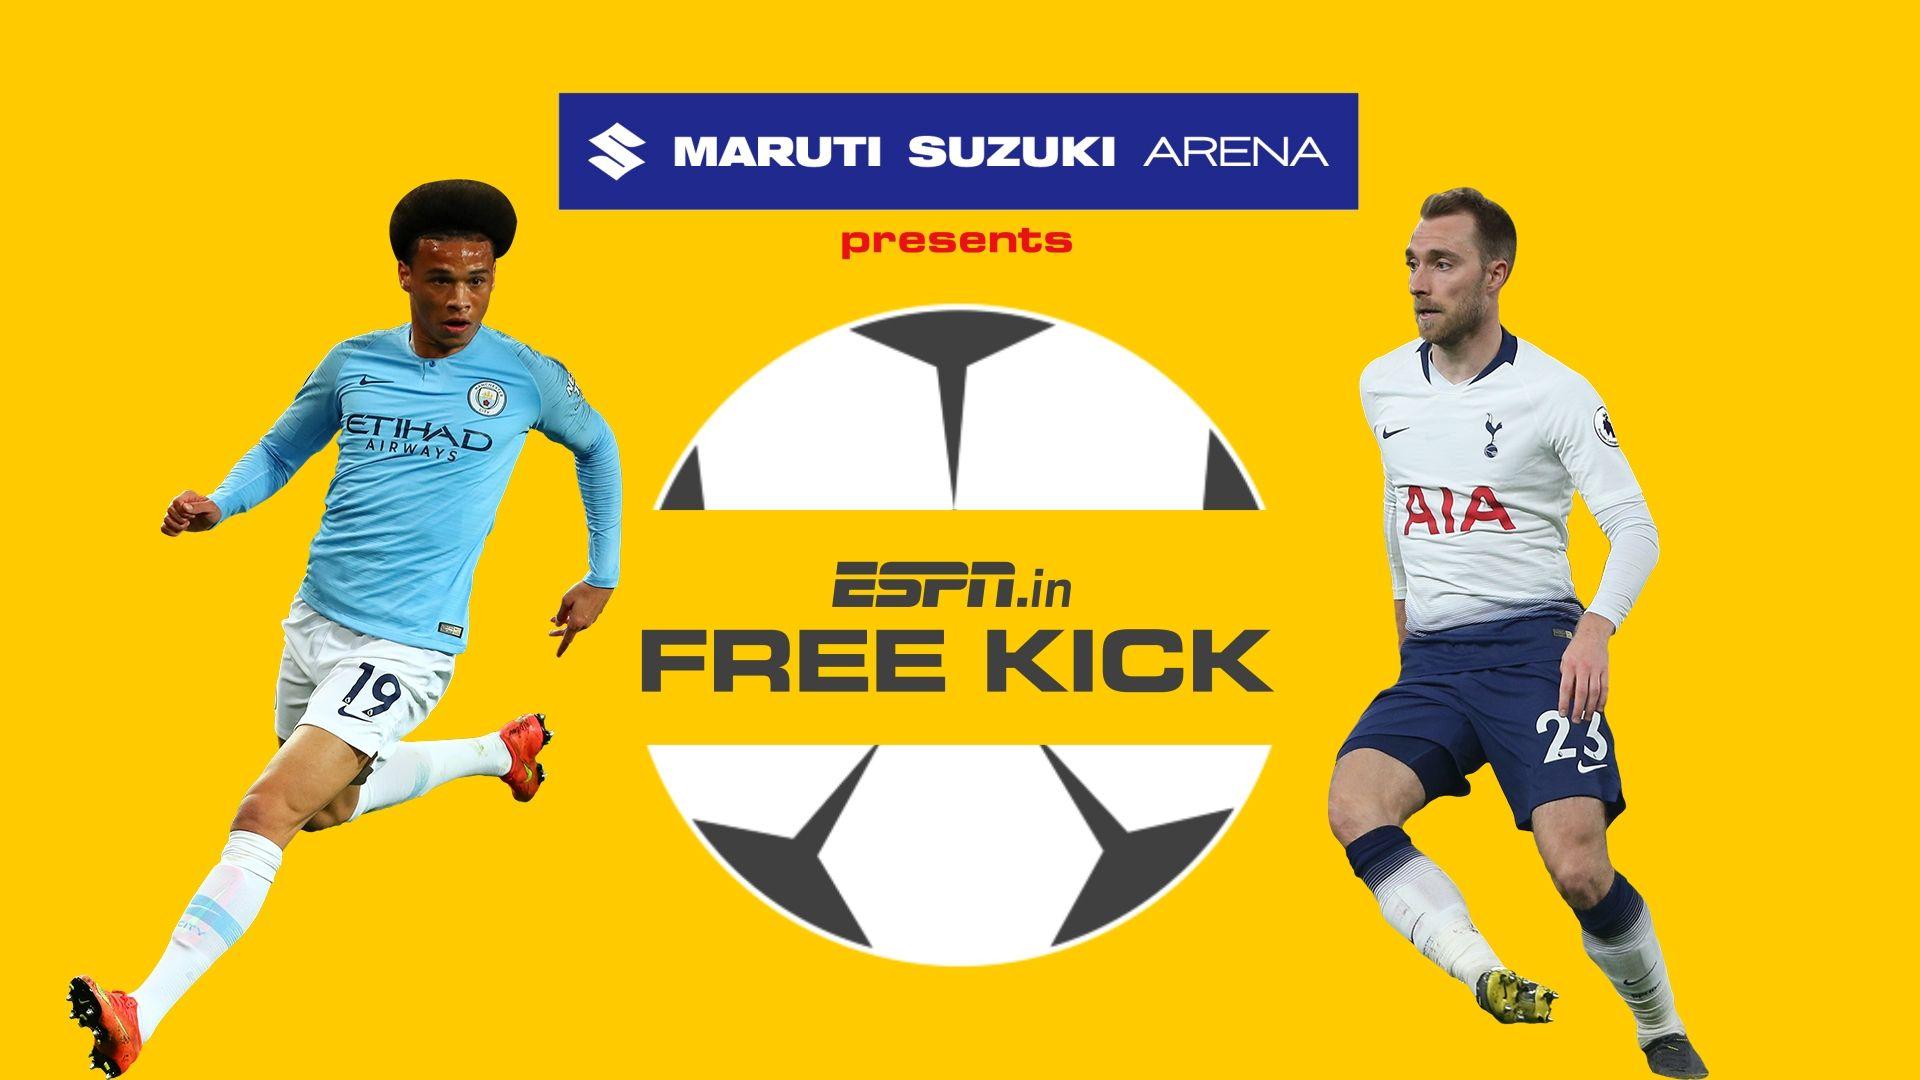 Maruti Suzuki Arena Presents ESPN.in Free Kick Episode 8